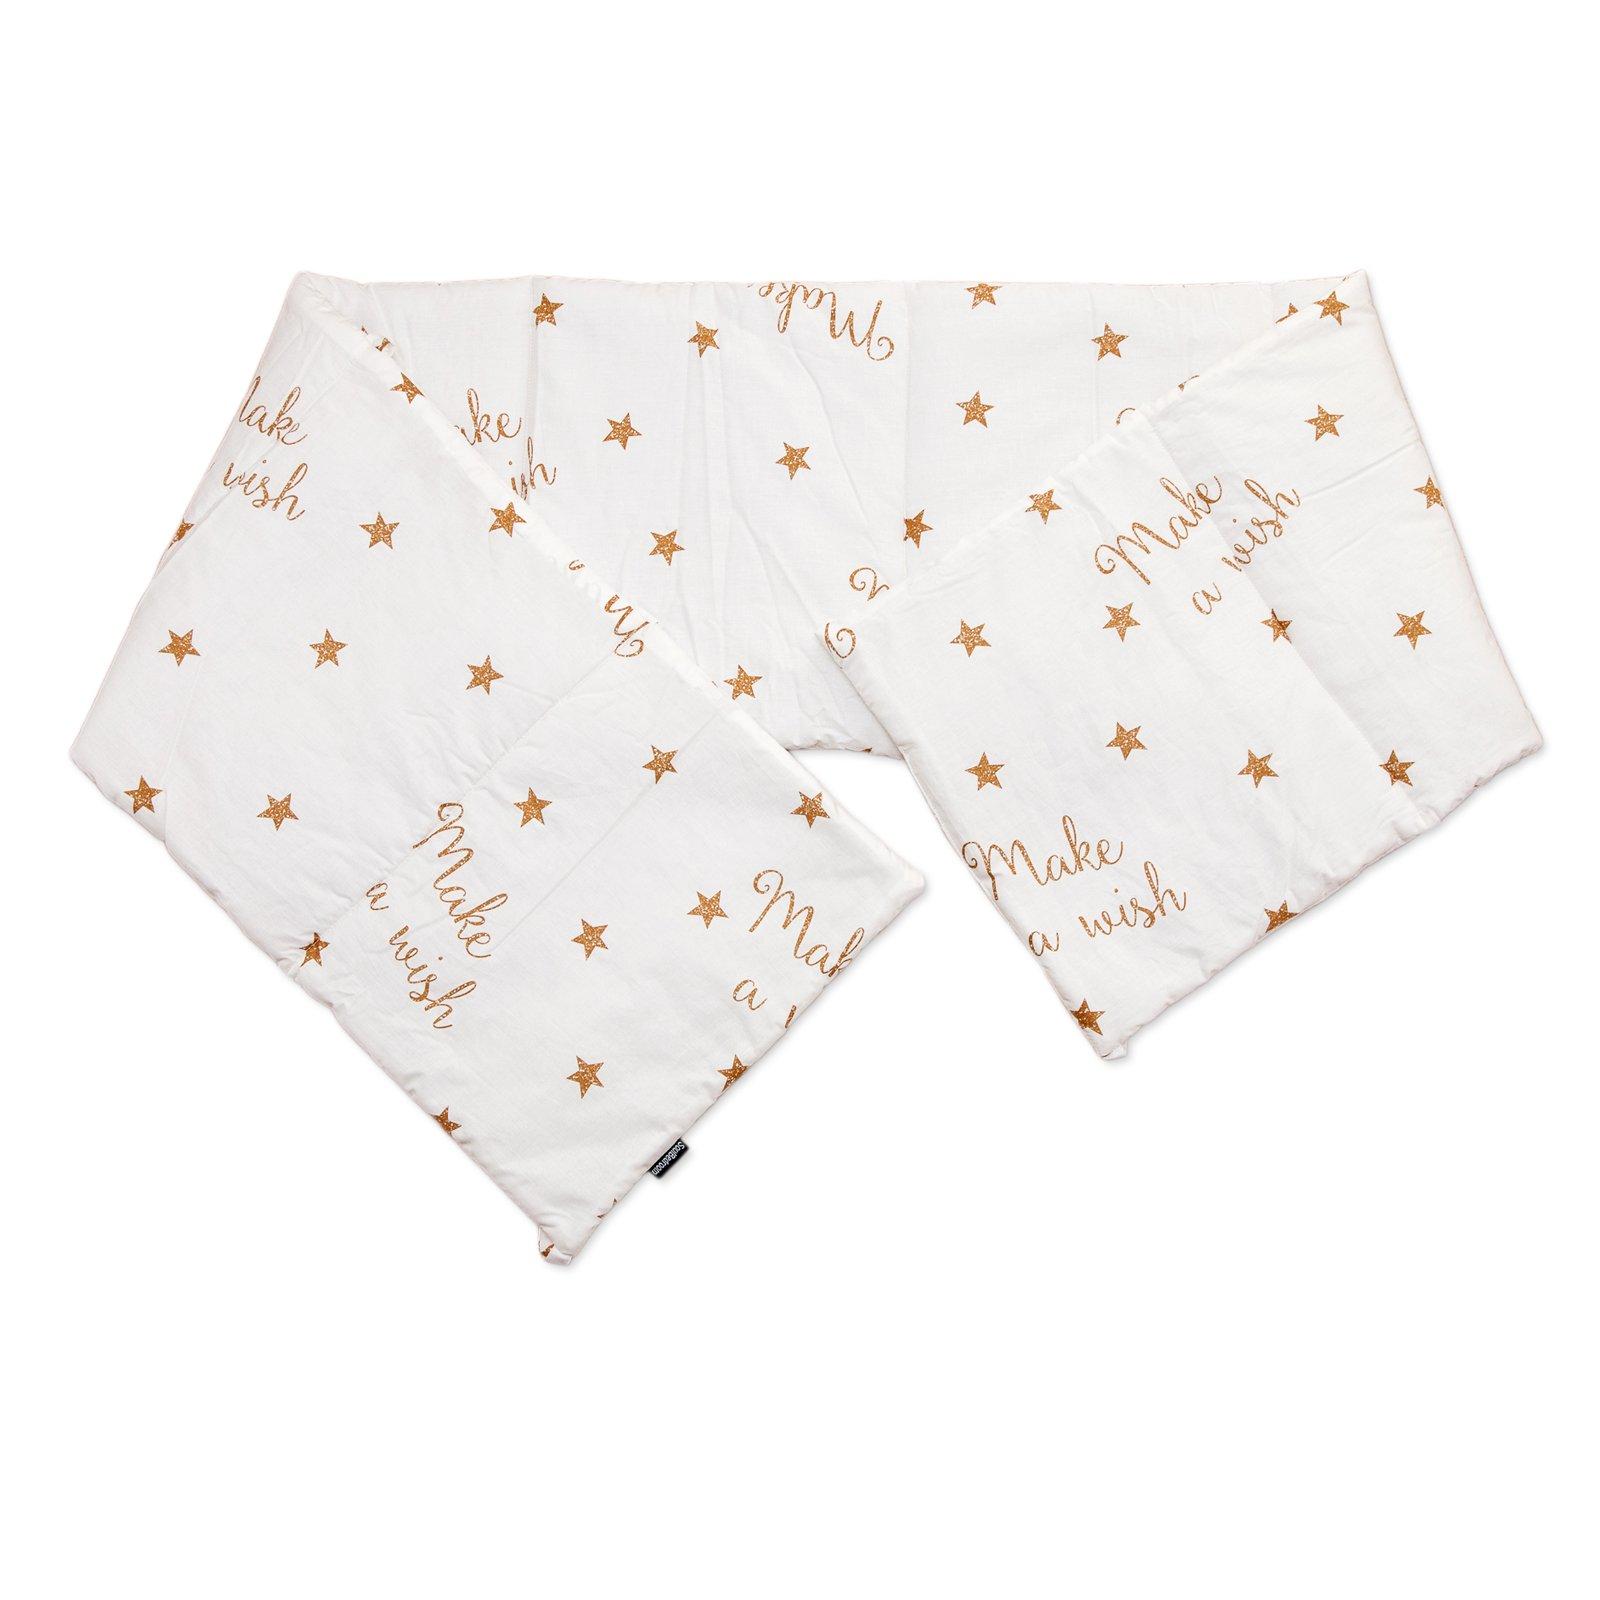 Baby Make a wish / SoulBedroom Cotton Cot Bumper Pad Half (210x40 cm)